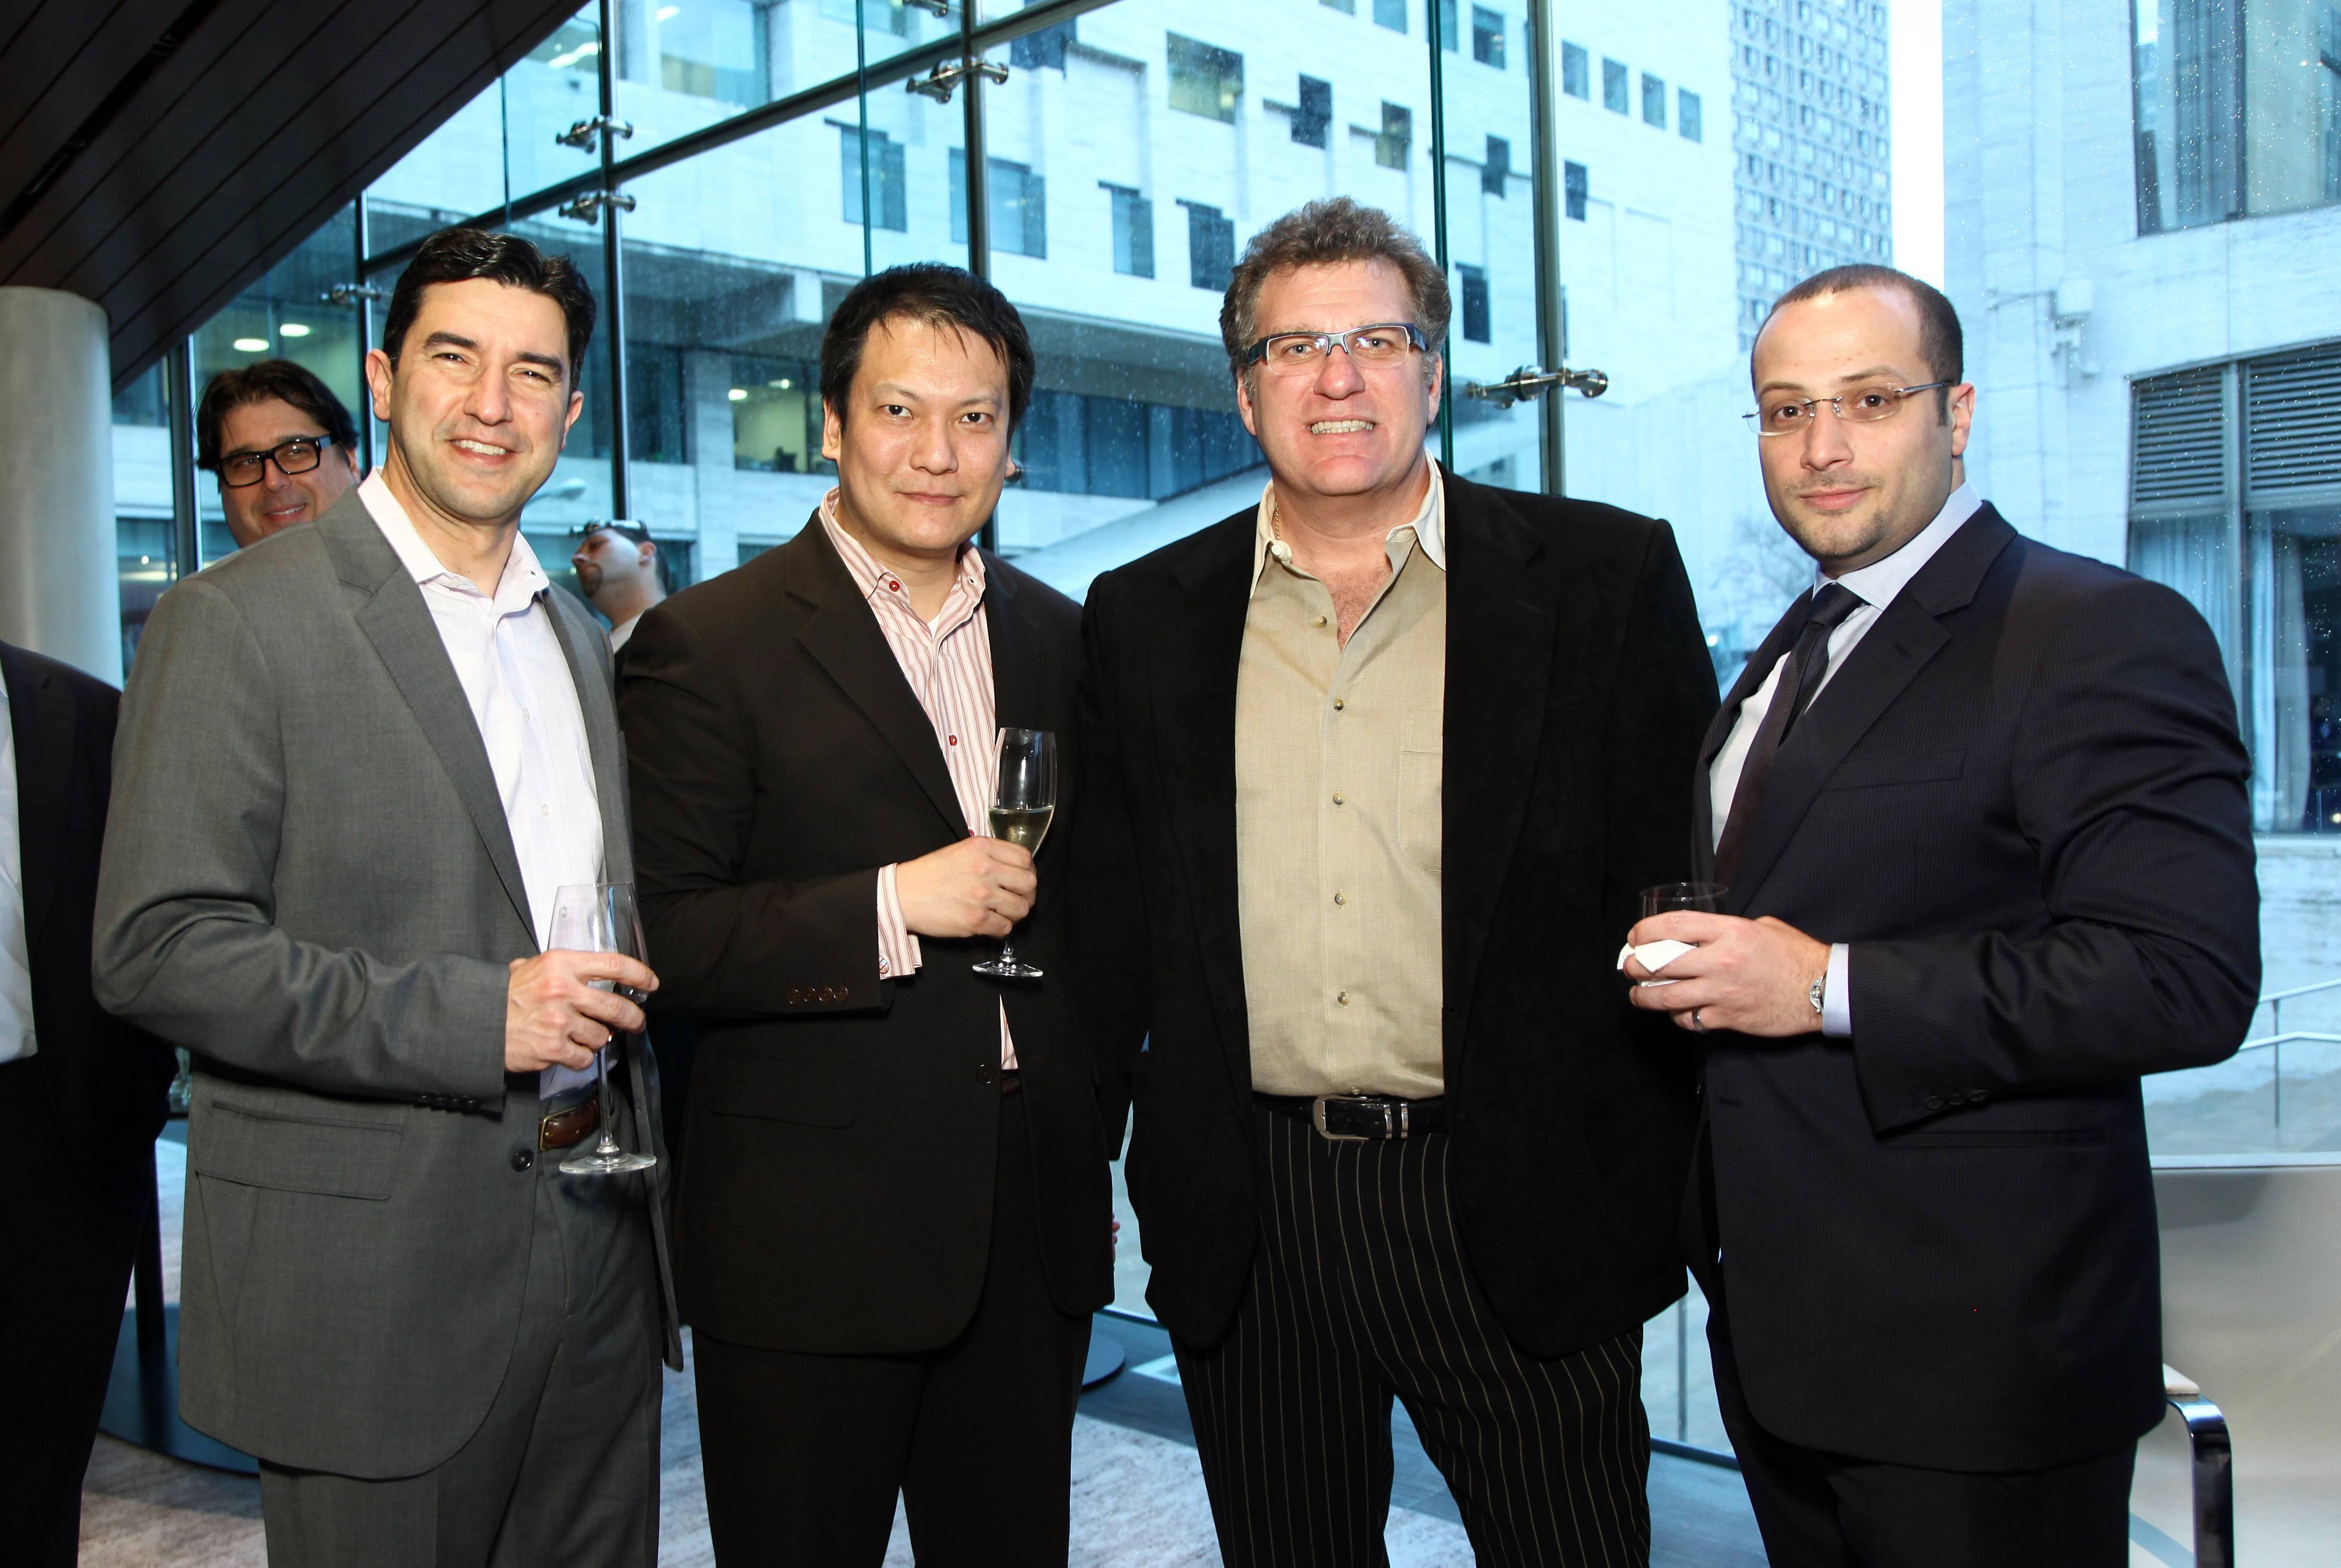 Jose Fernandez, Luke Taxi, Dr. Mathew Eisenberg, Sharif Abdelfattah (2)